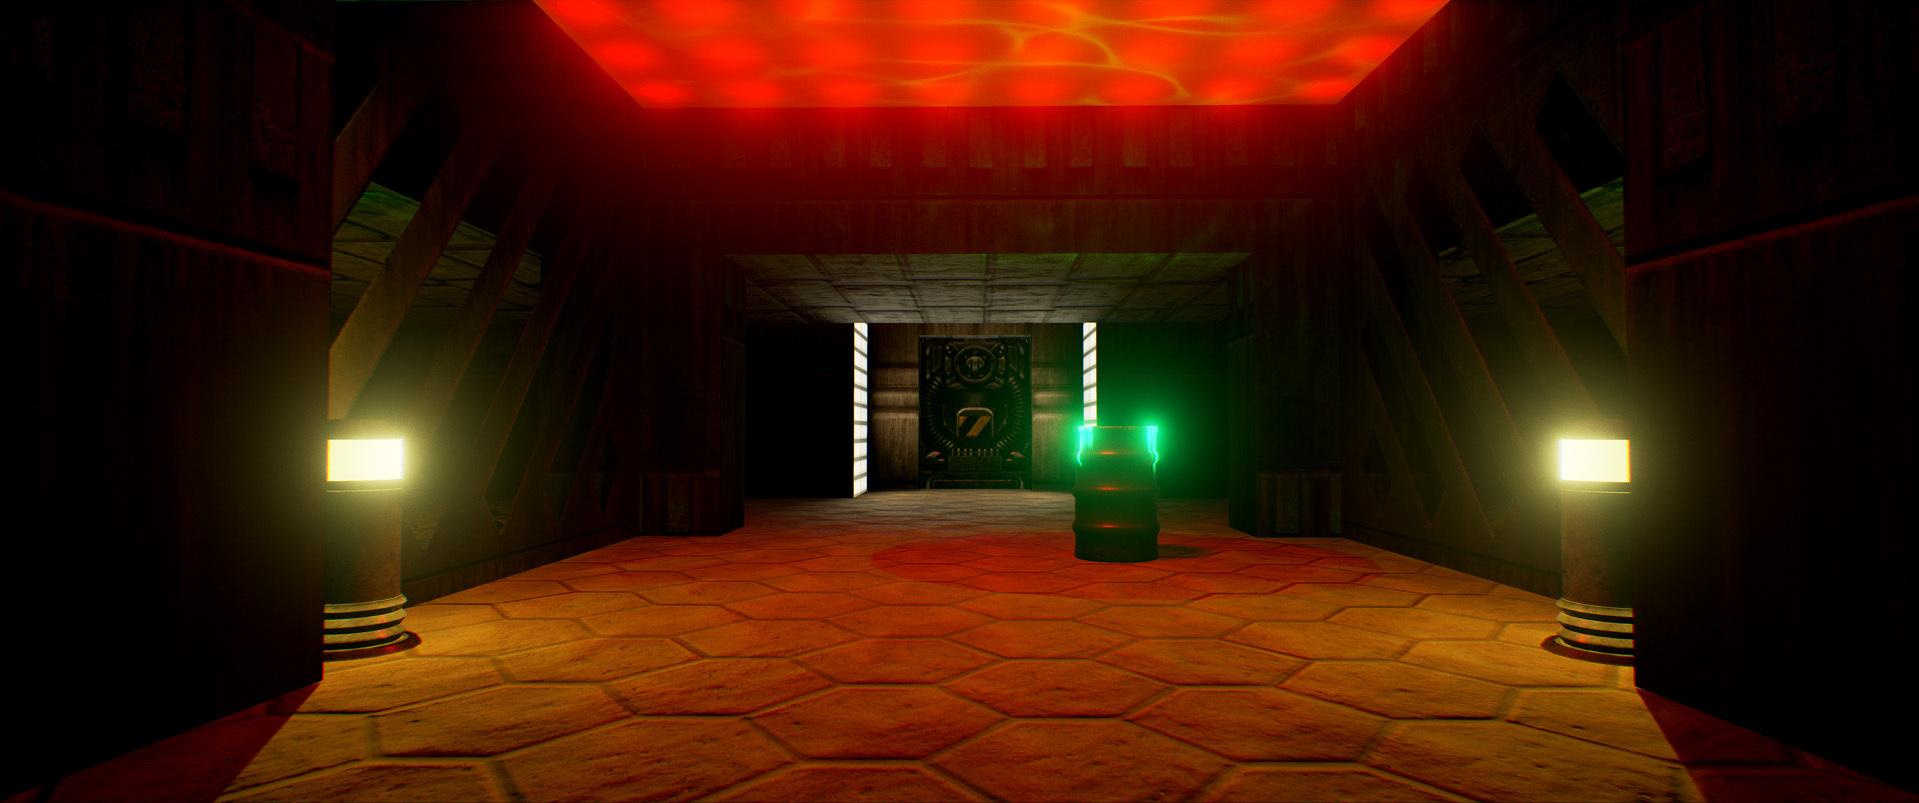 Foto de Nivel E1M1 de Doom en Unreal Engine (8/13)